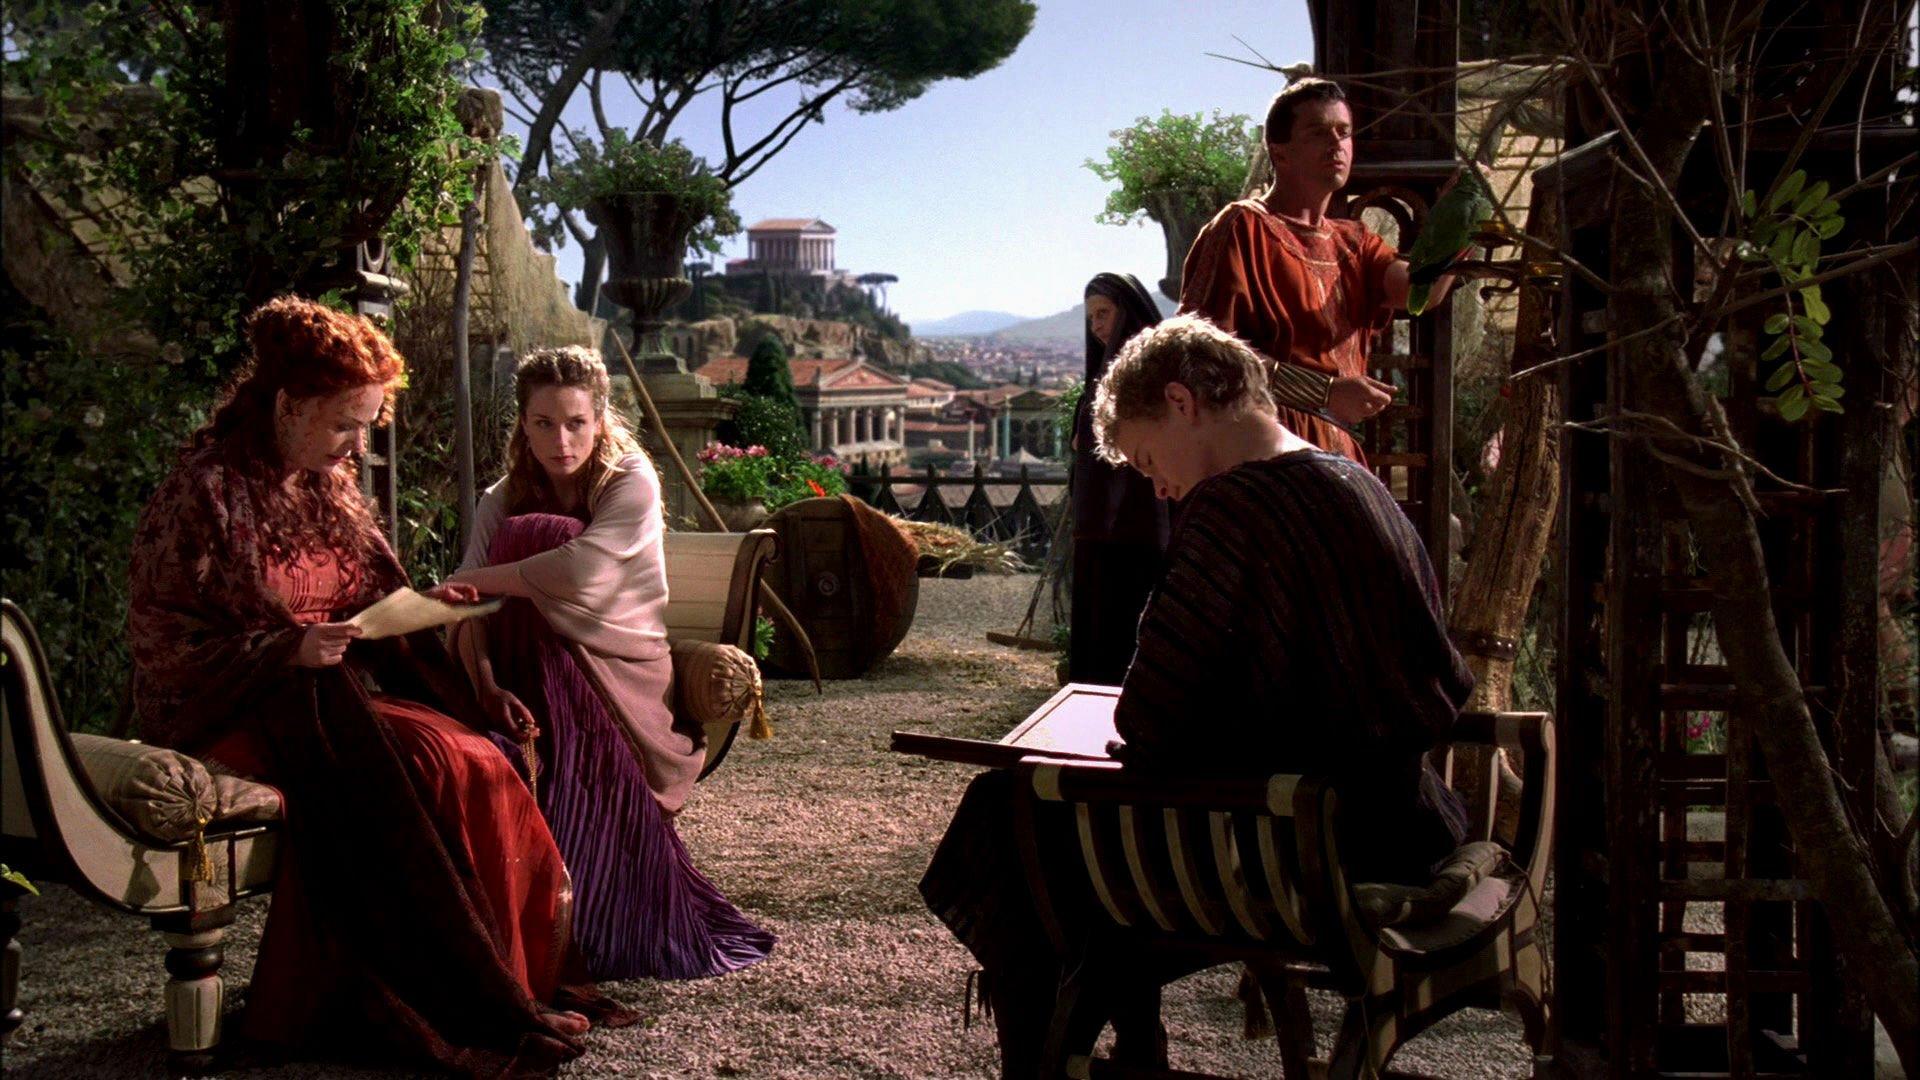 Year Of Action >> HBO Rome Wallpaper - WallpaperSafari